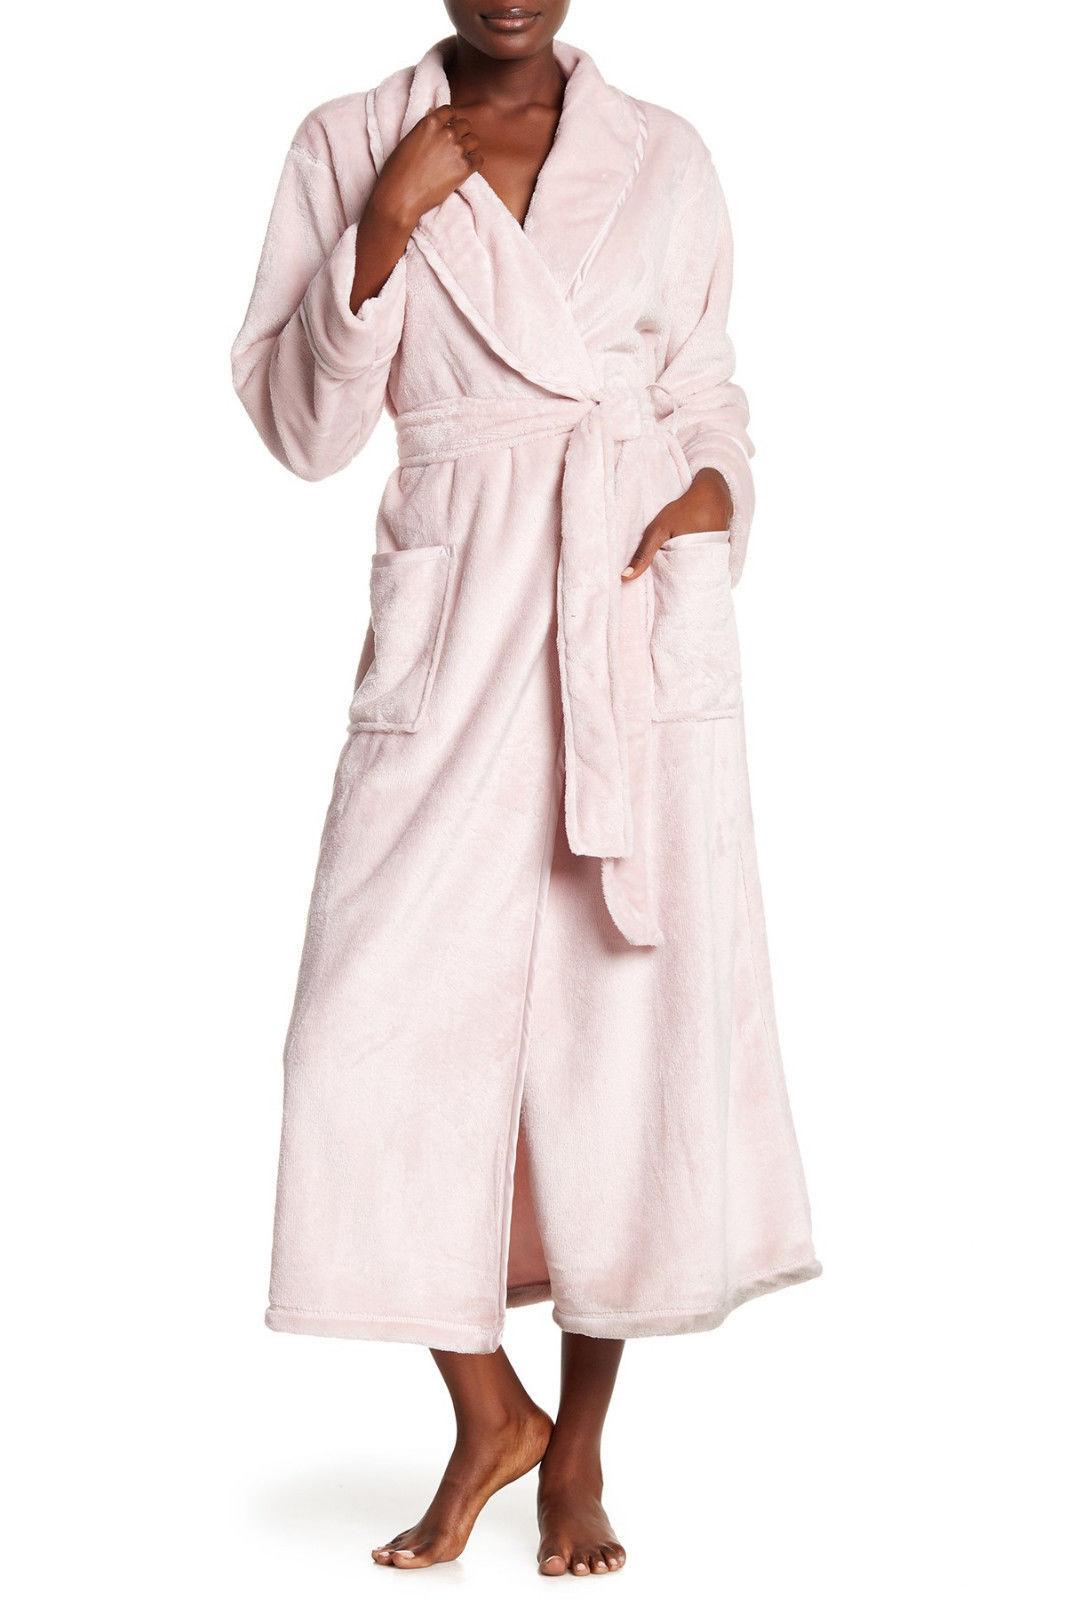 NWT New Natori Pink Faux Fur Robe Womens Long Very Soft Pockets M Dusty Rose Lus